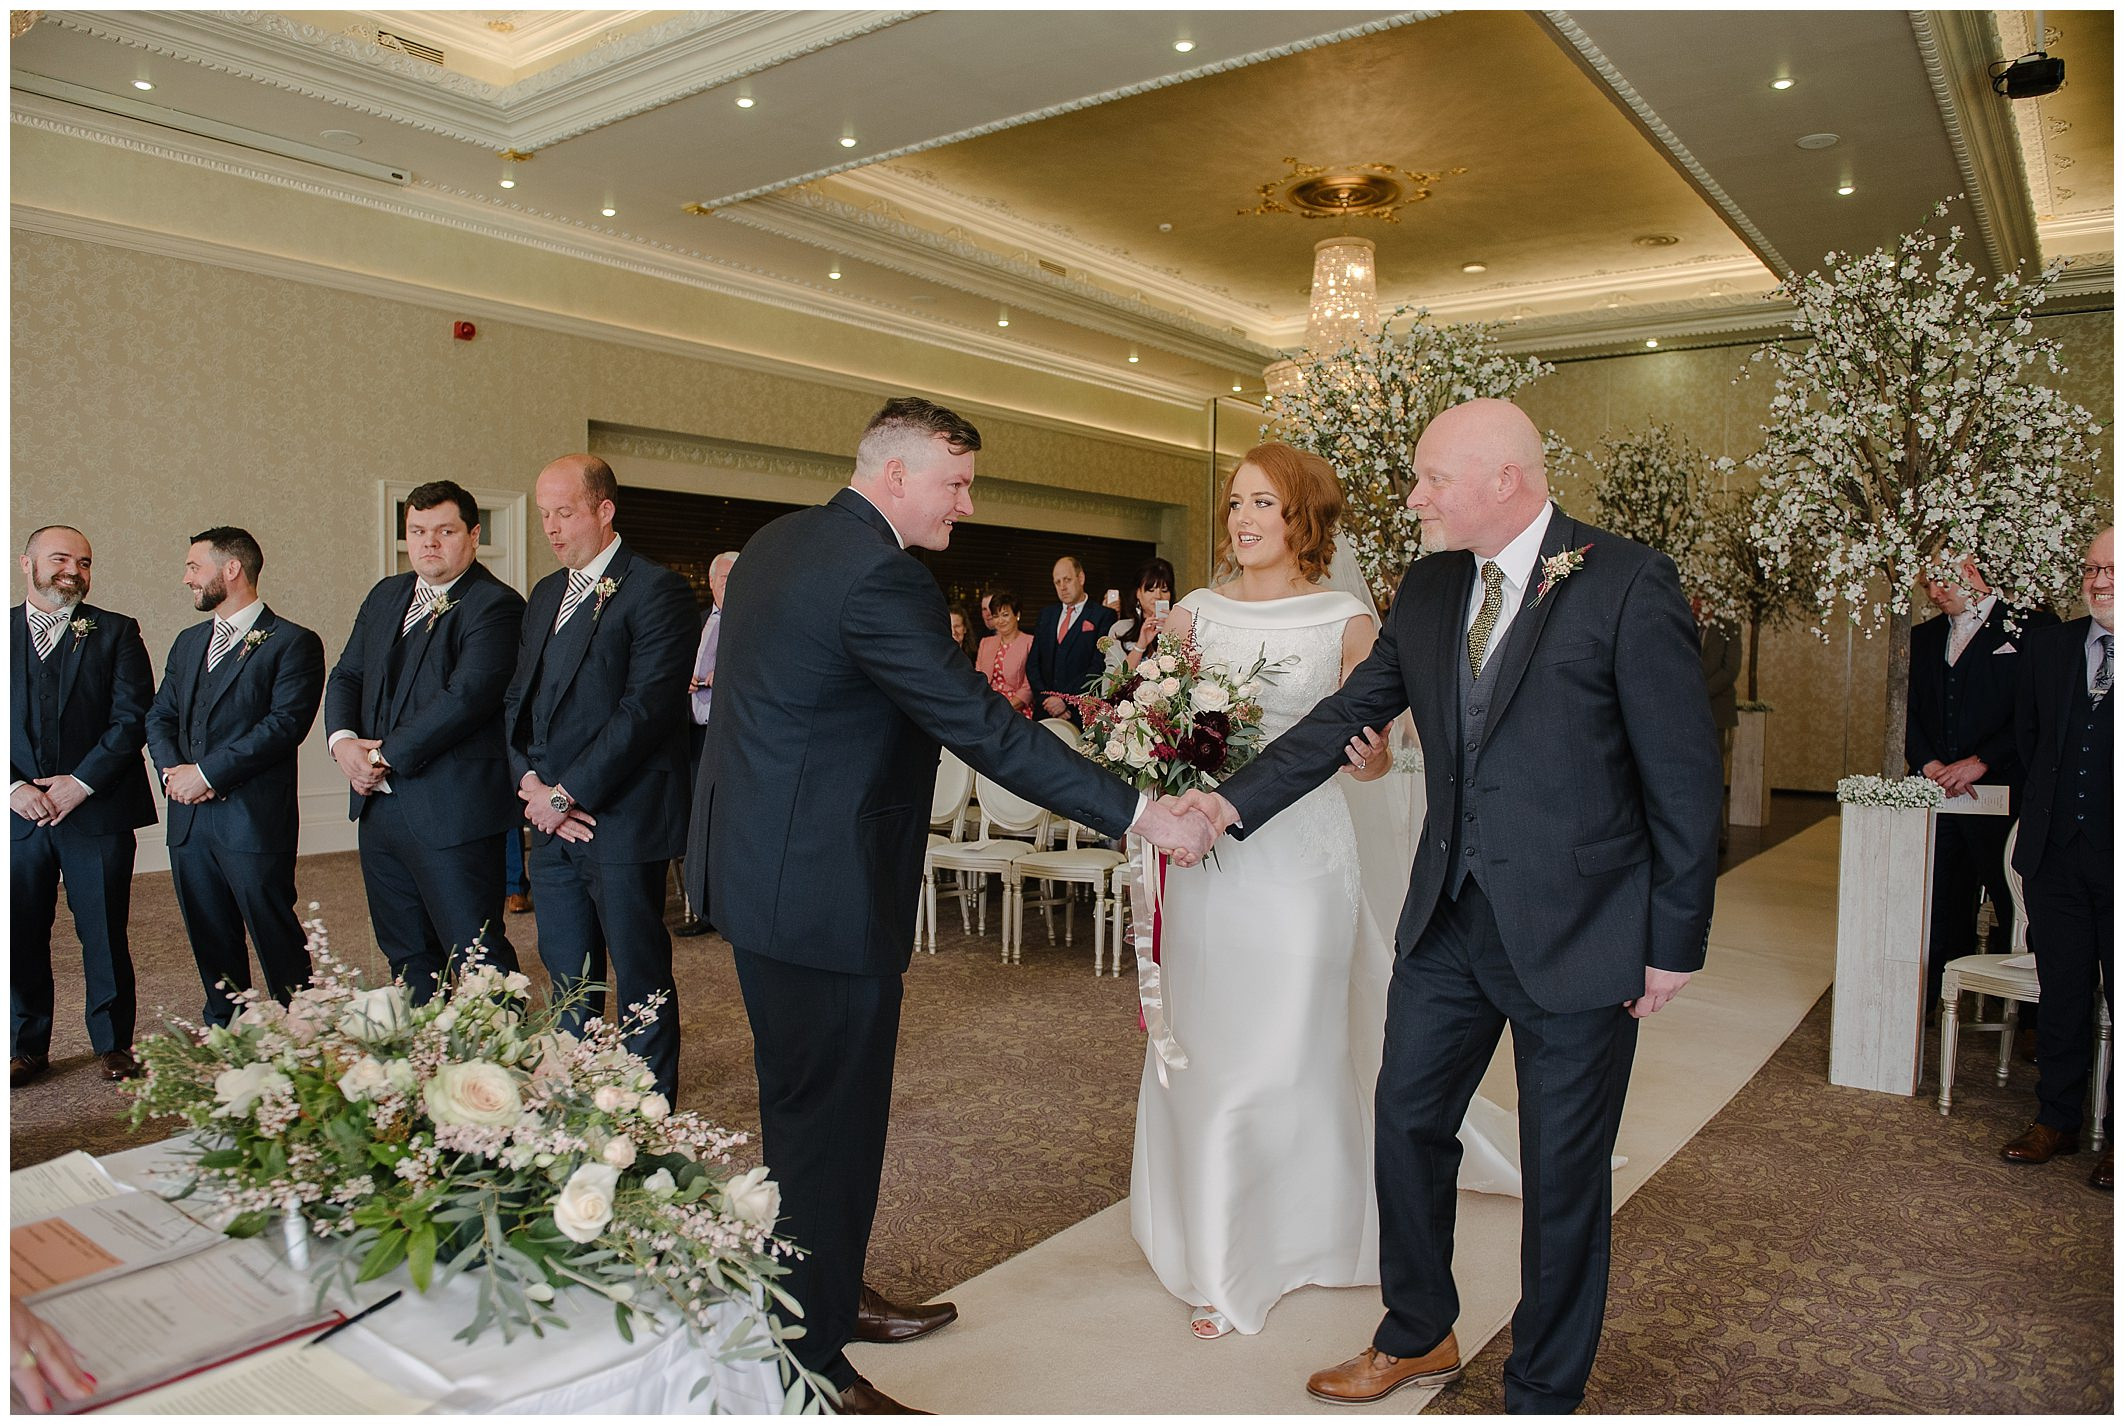 corick-house-wedding-hannah-gary-jude-browne-photography_0032.jpg